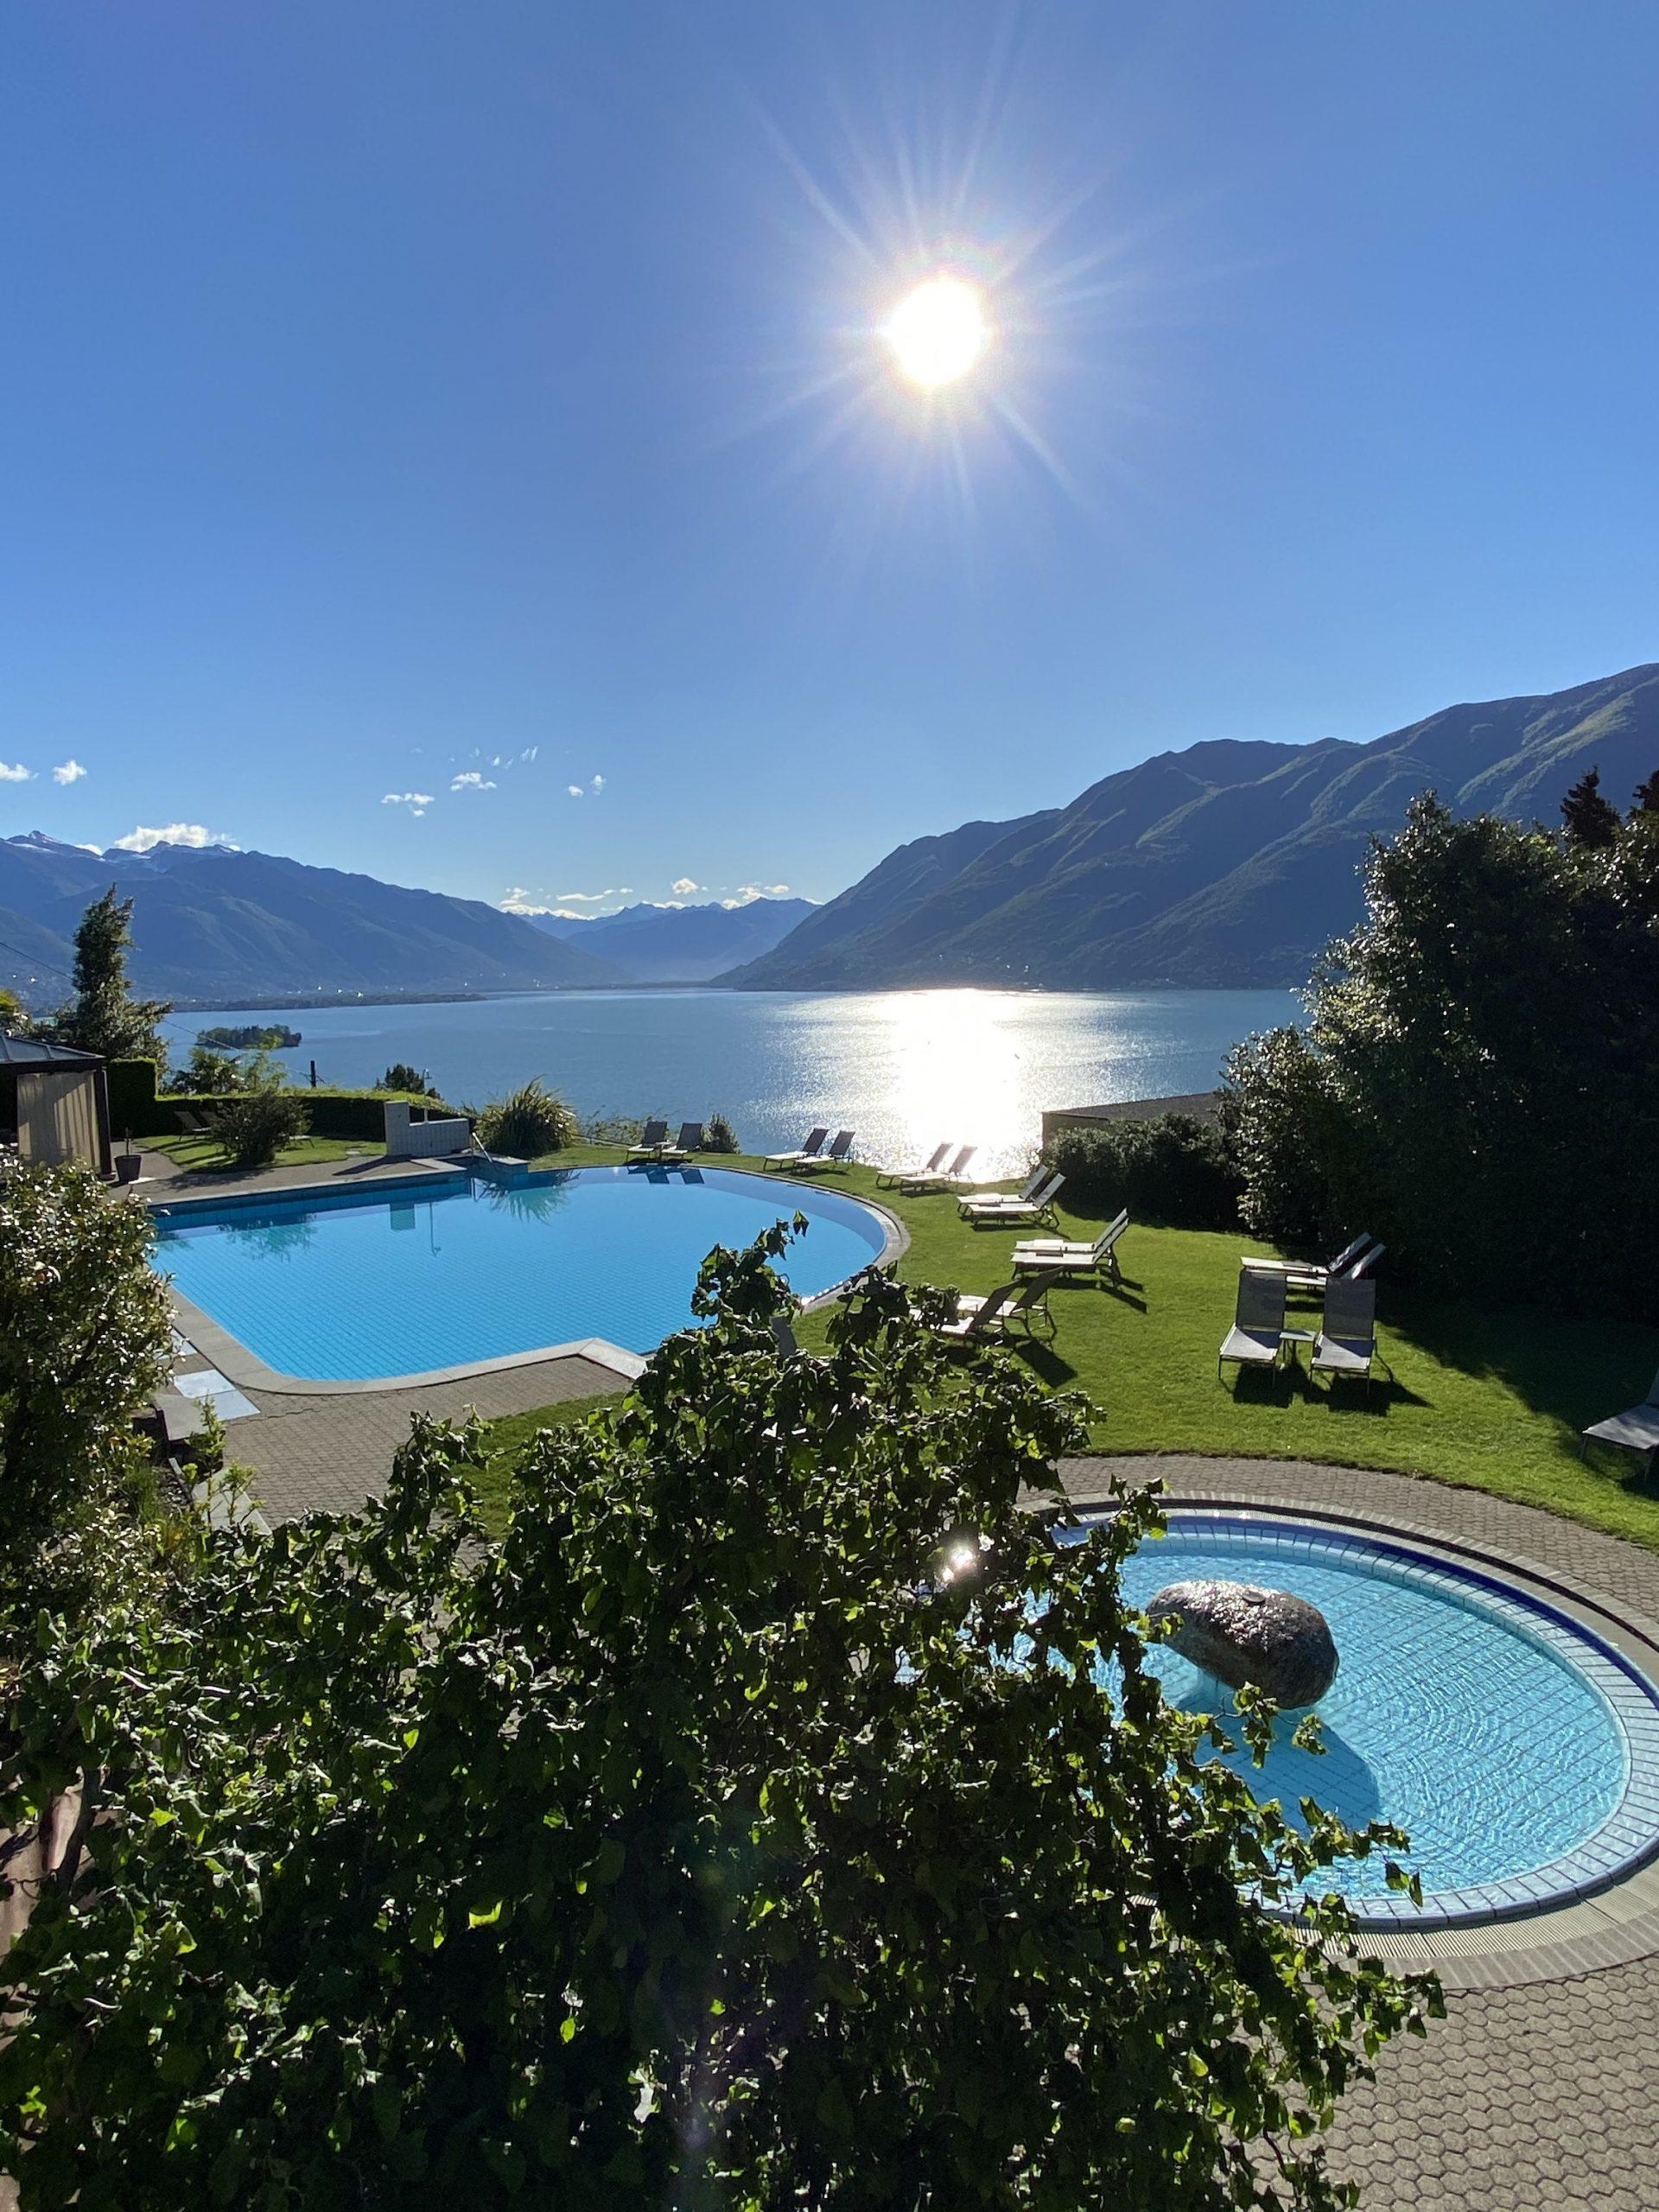 Brenscino pool - hotels in Brissago